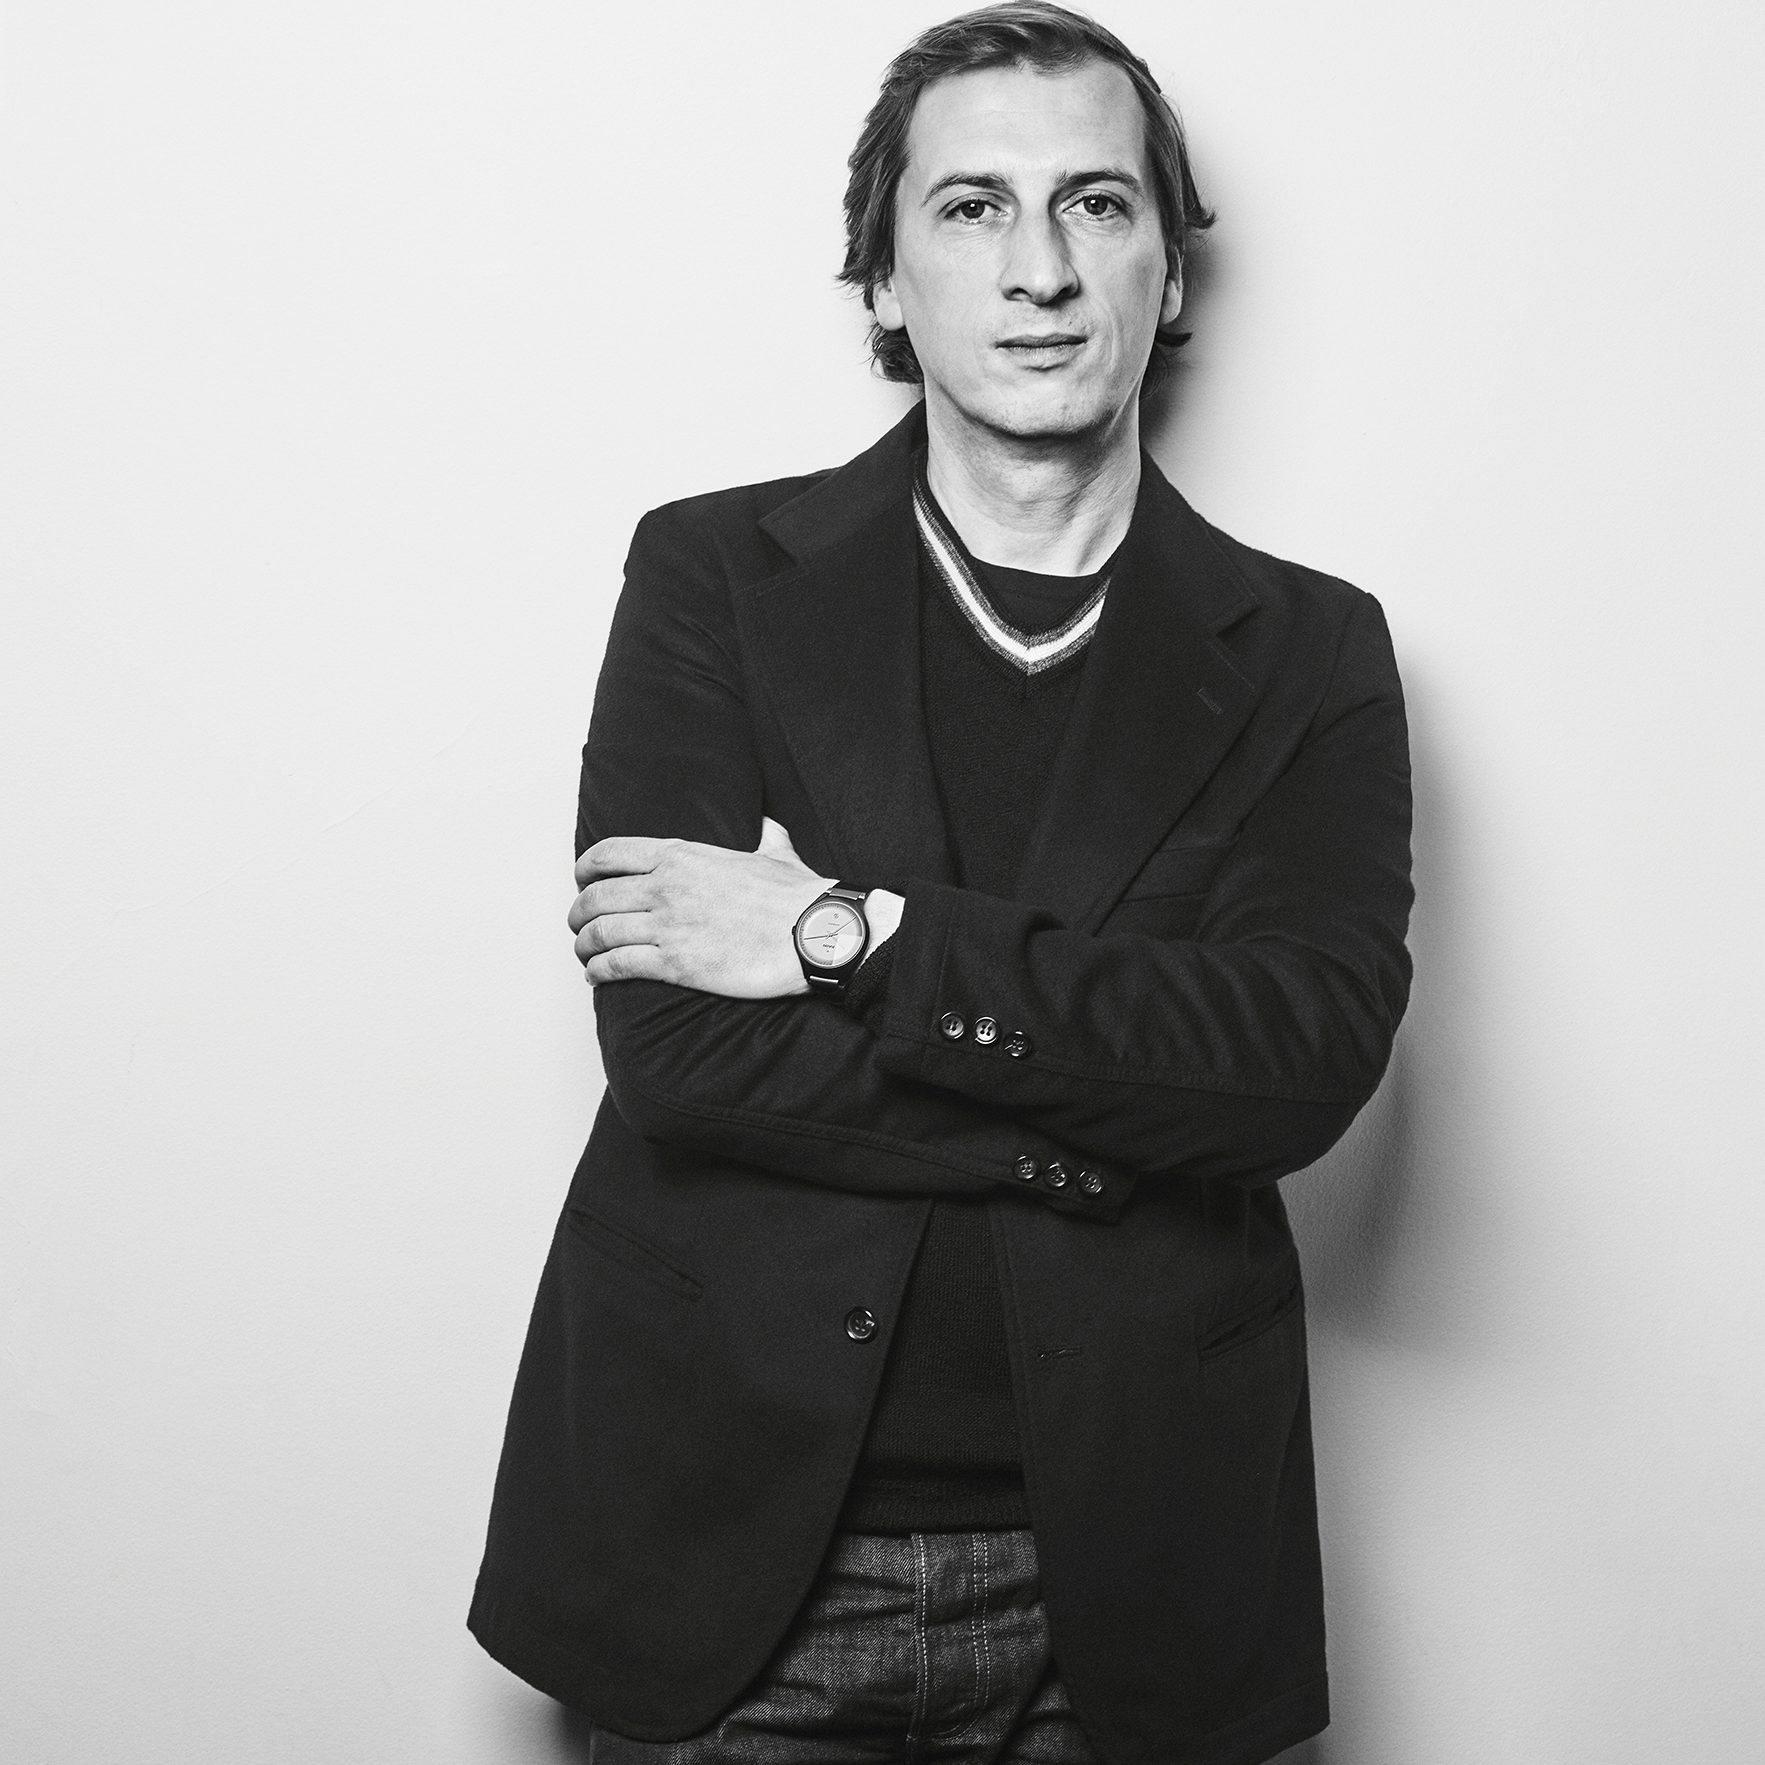 Portrait of French designer Philippe Nigro at design and furniture gallery Casati Gallery